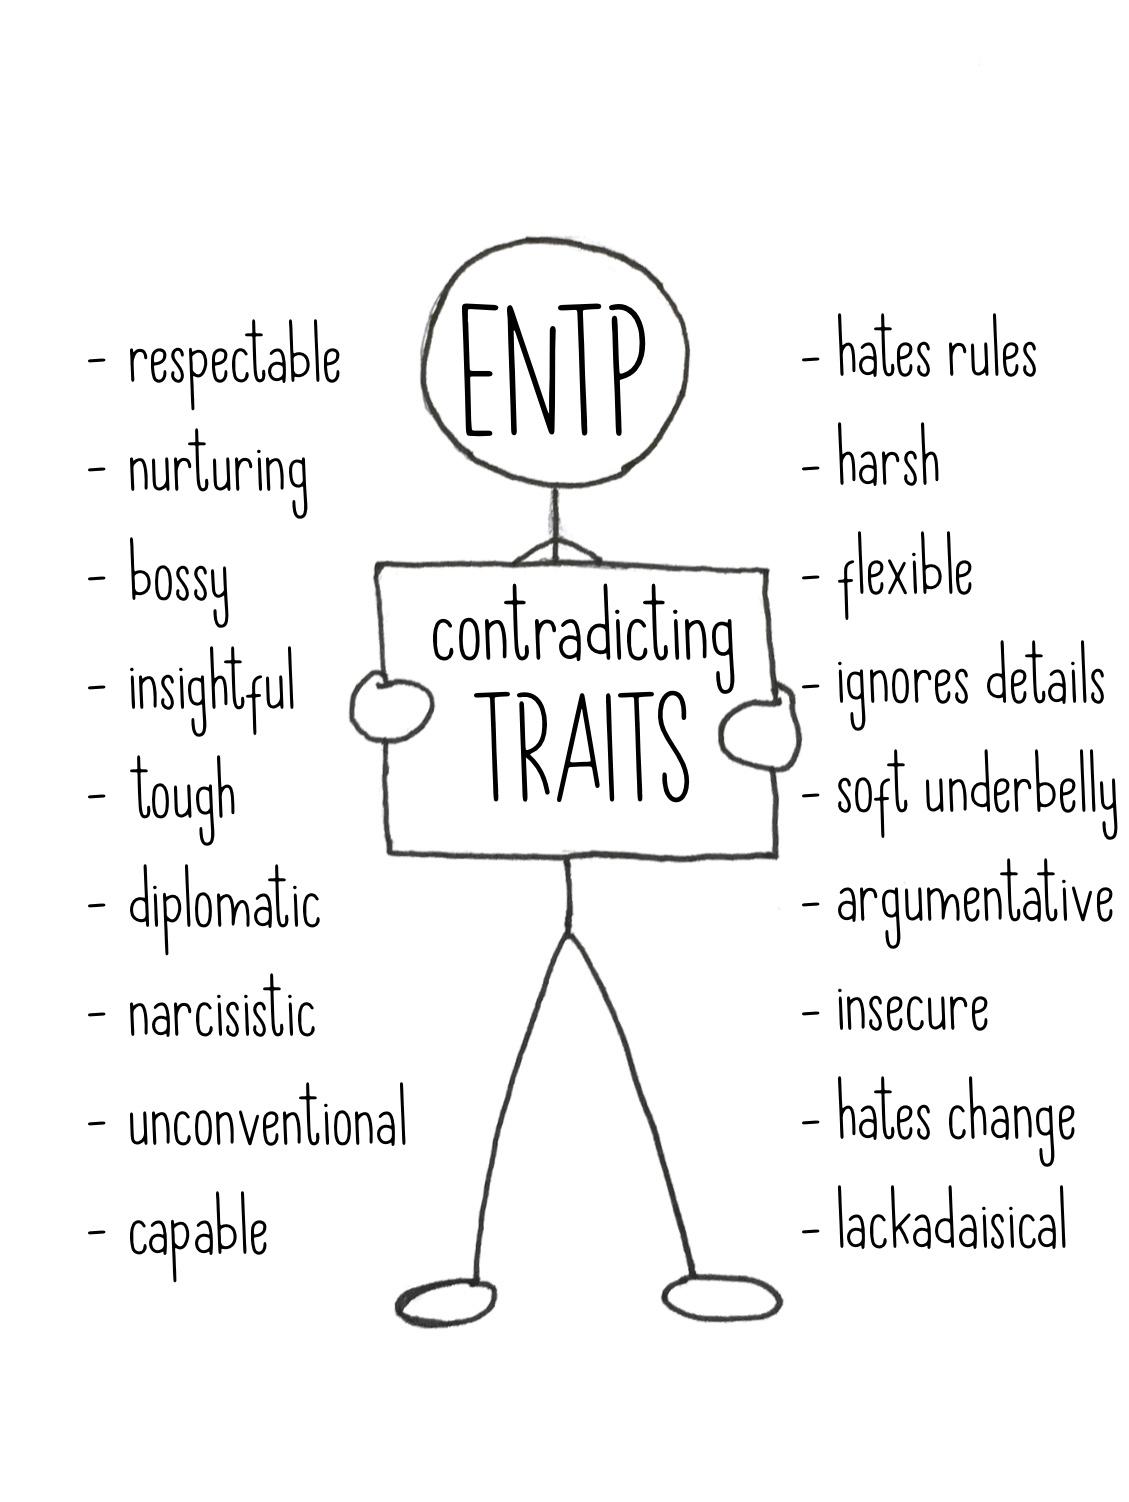 ENTP: Contradicting Traits